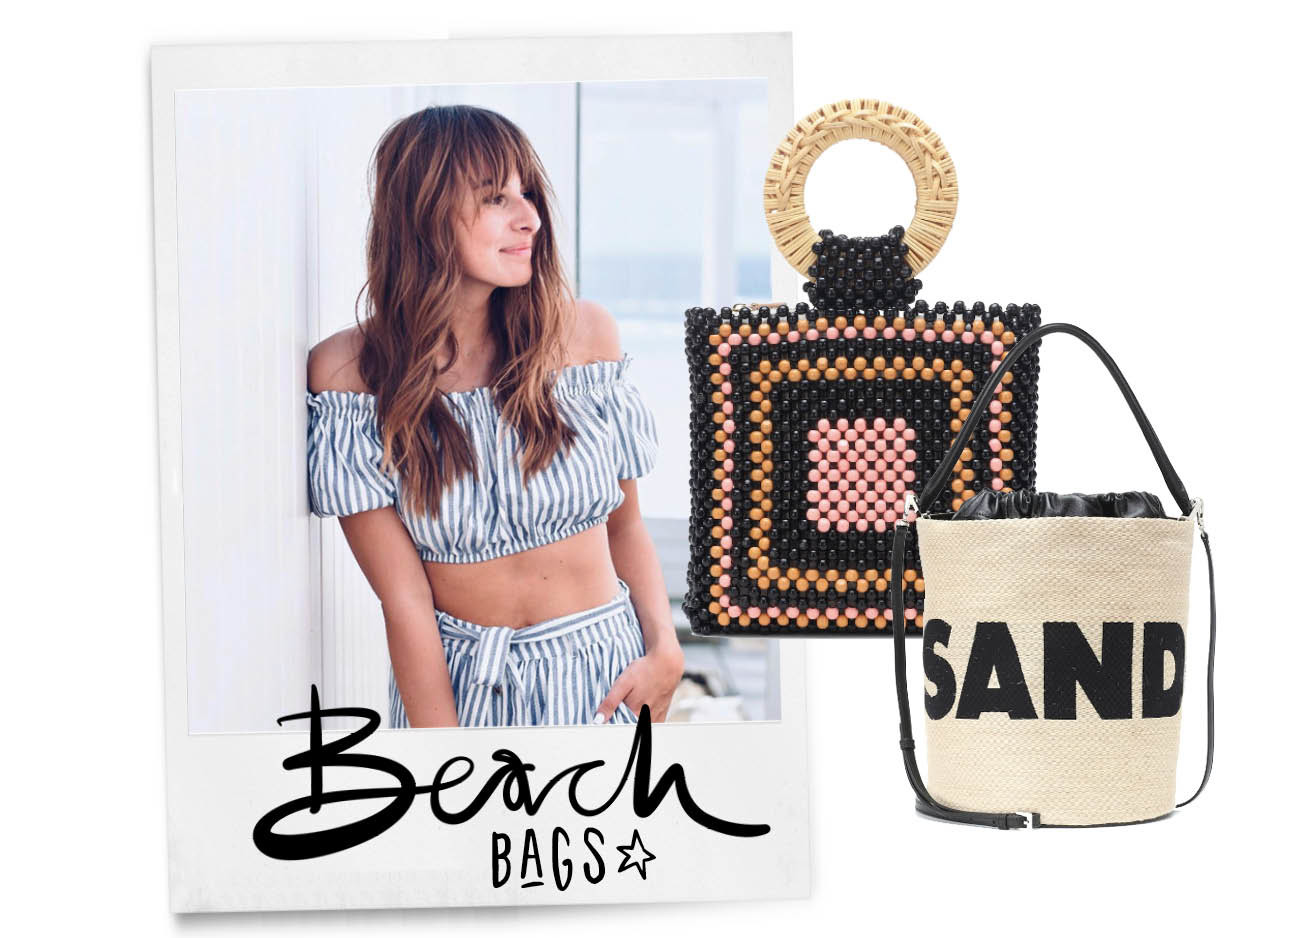 Lilian Brijl lachend met shopping strandtassen